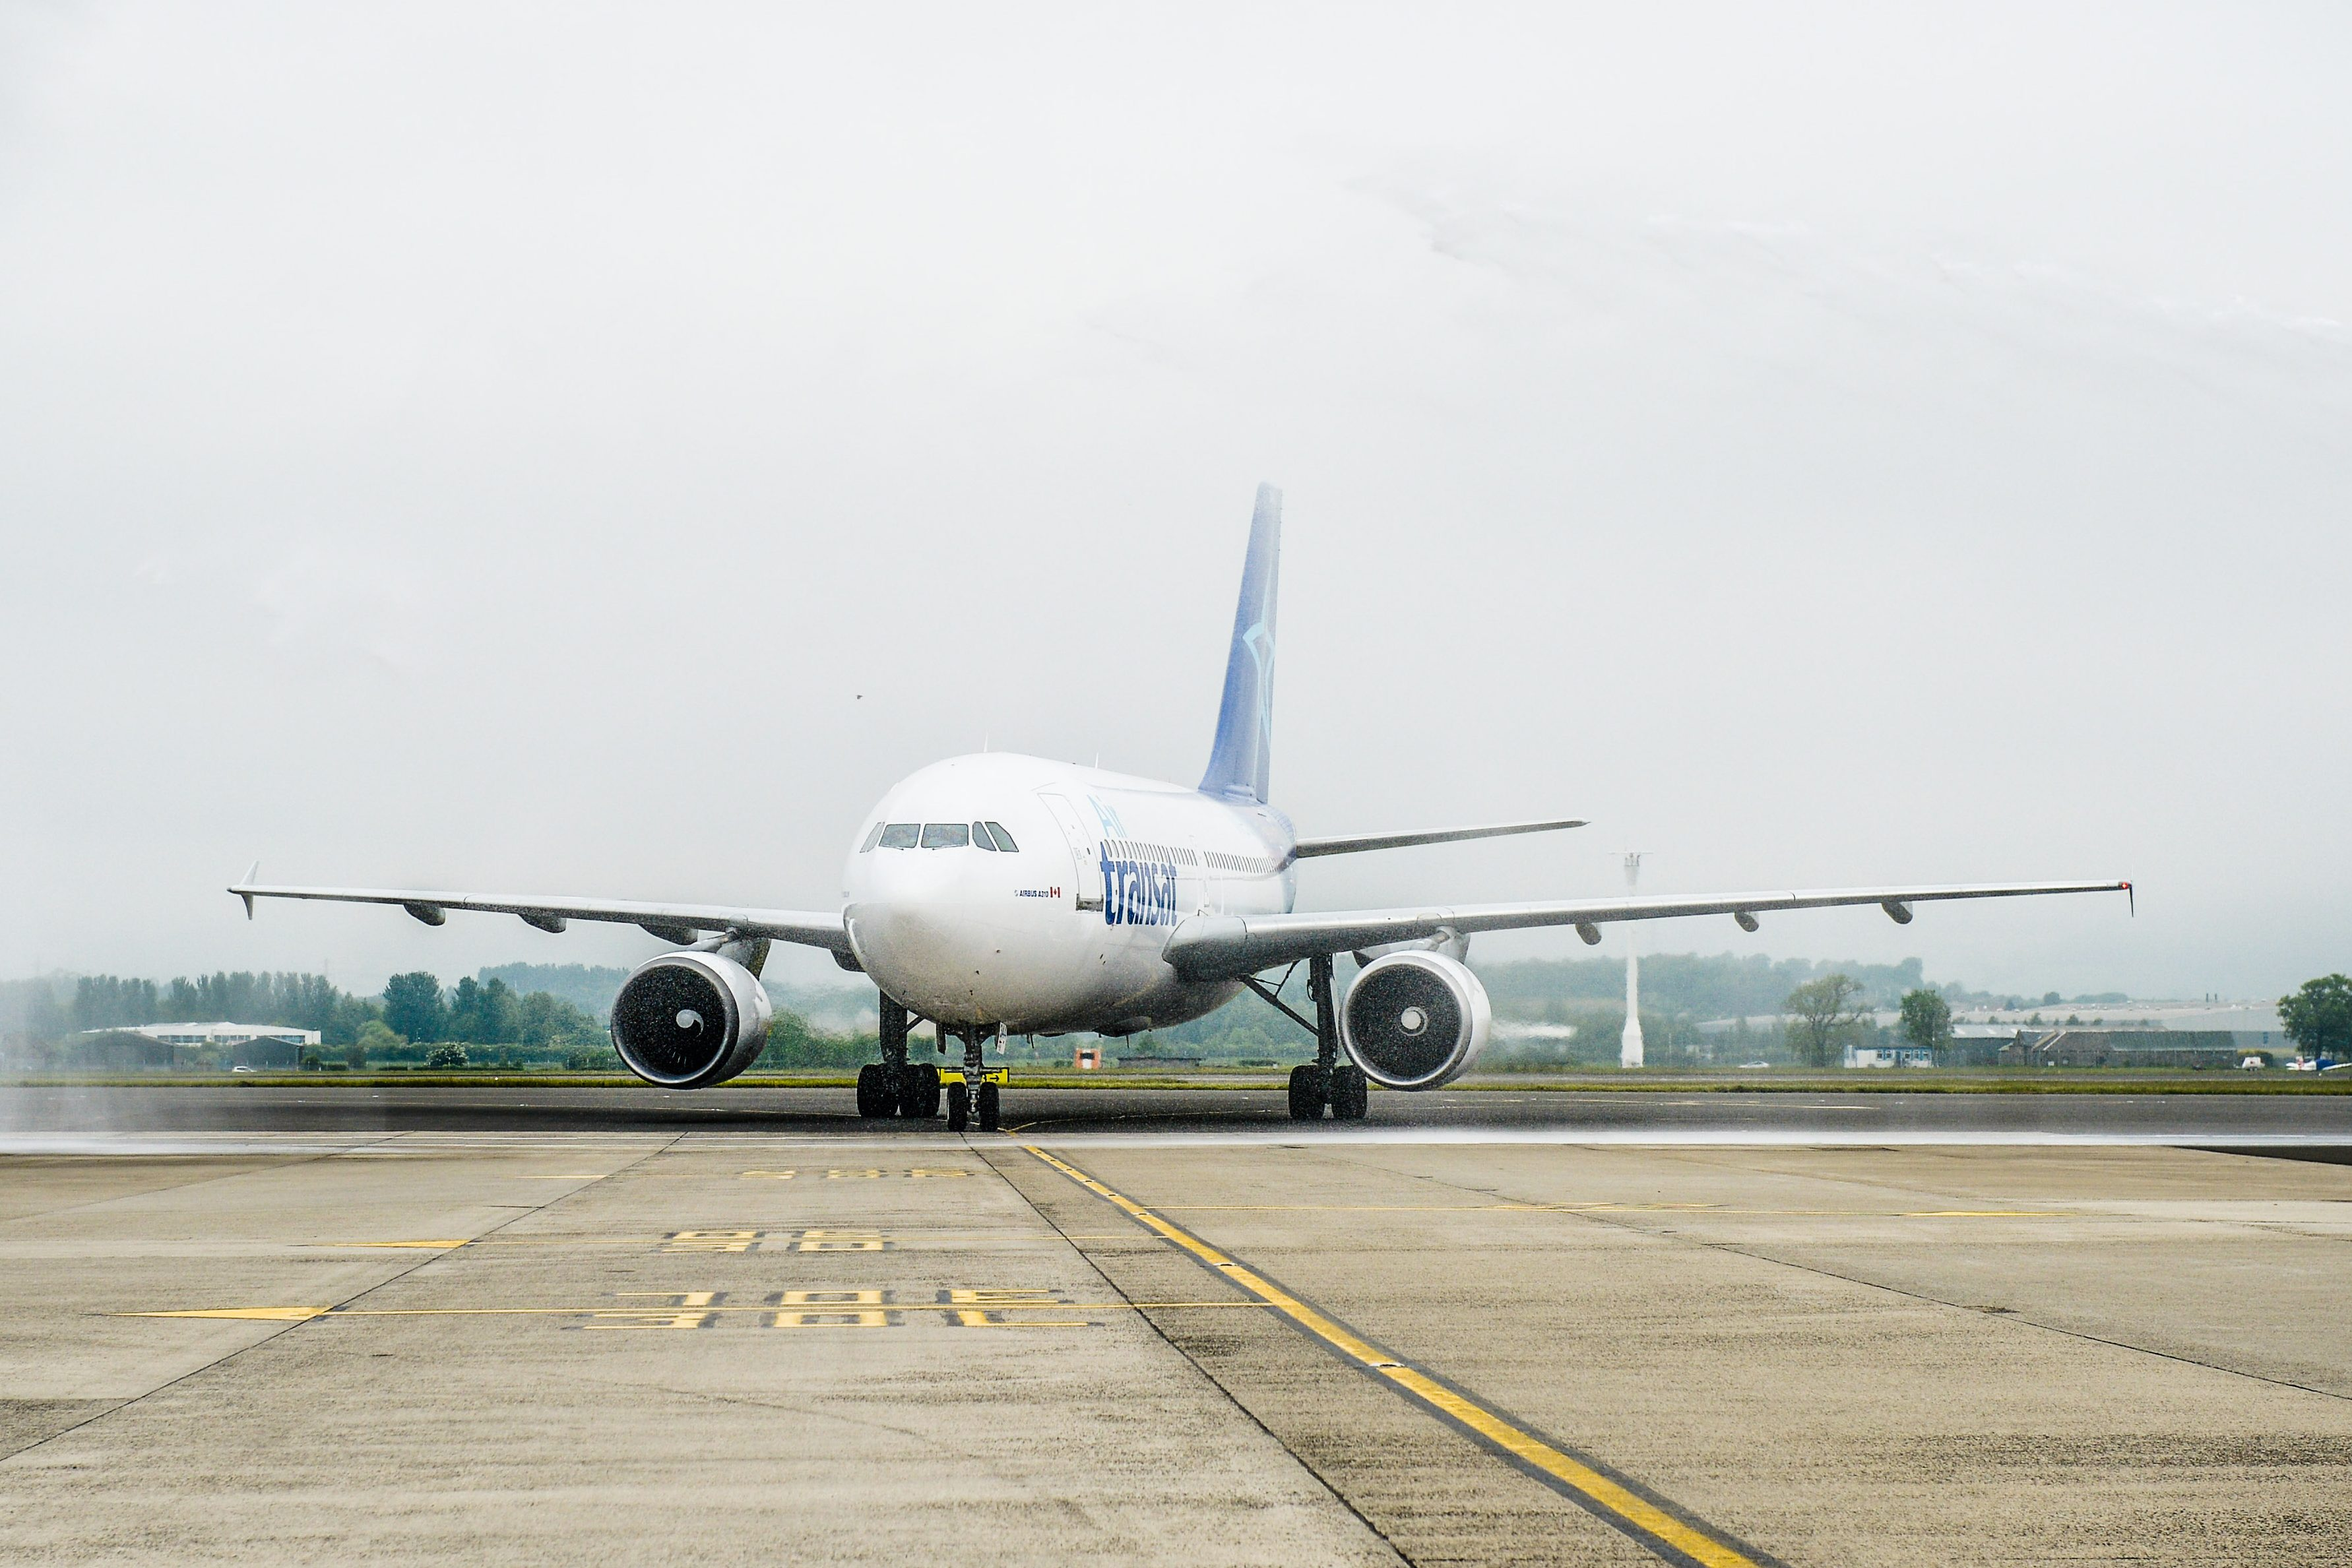 transat official airline partner of the toronto wolfpack travelpress